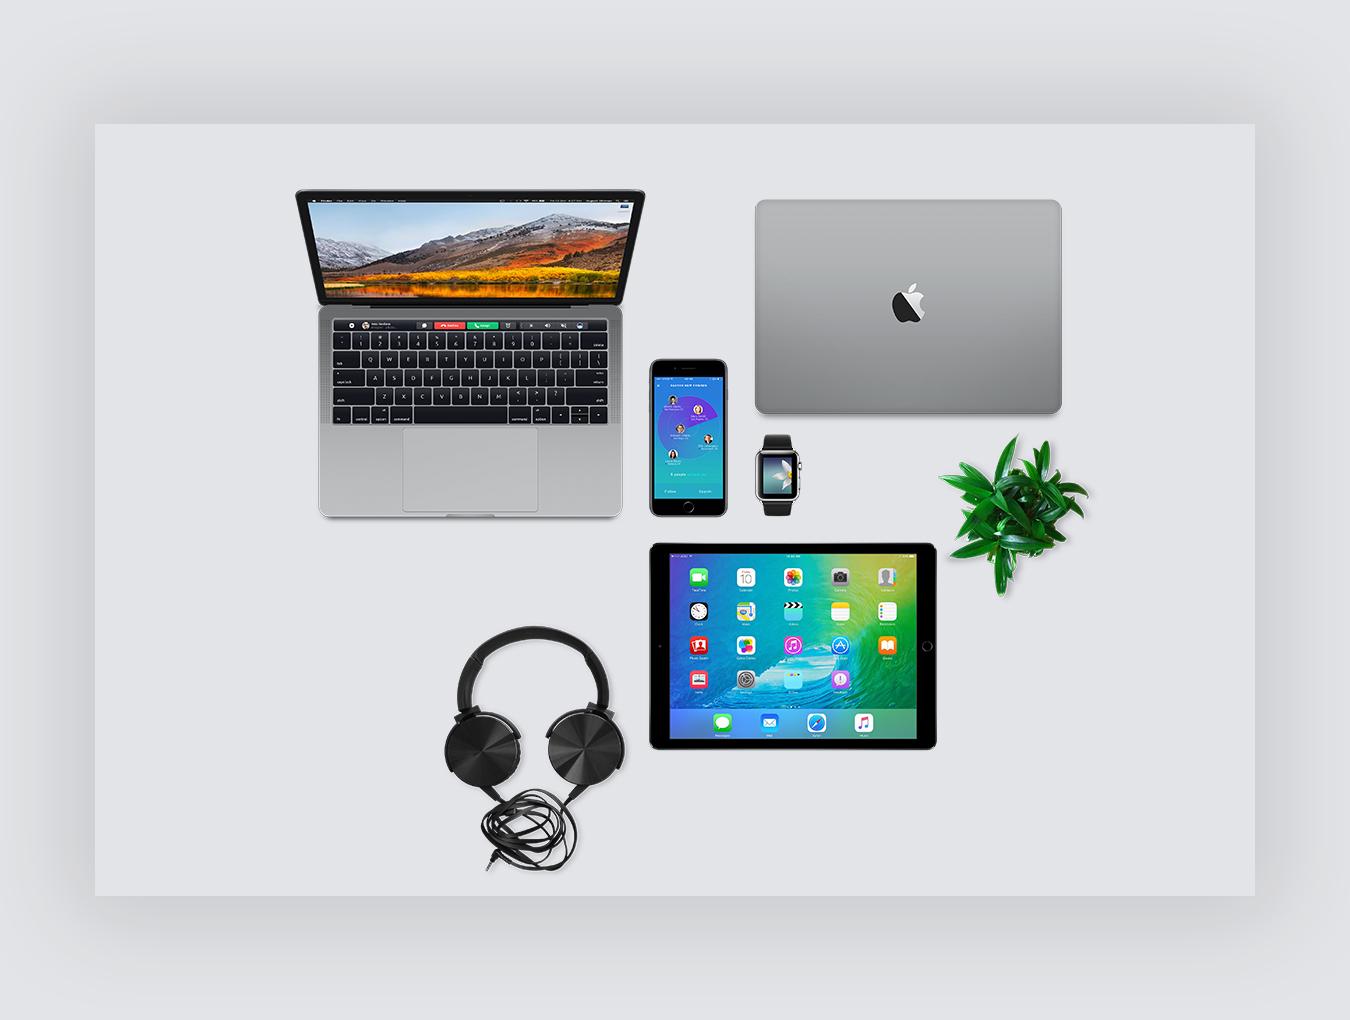 网页设计提案顶视图Apple设备展示样机 Ydlabs TopView Mockups插图(5)